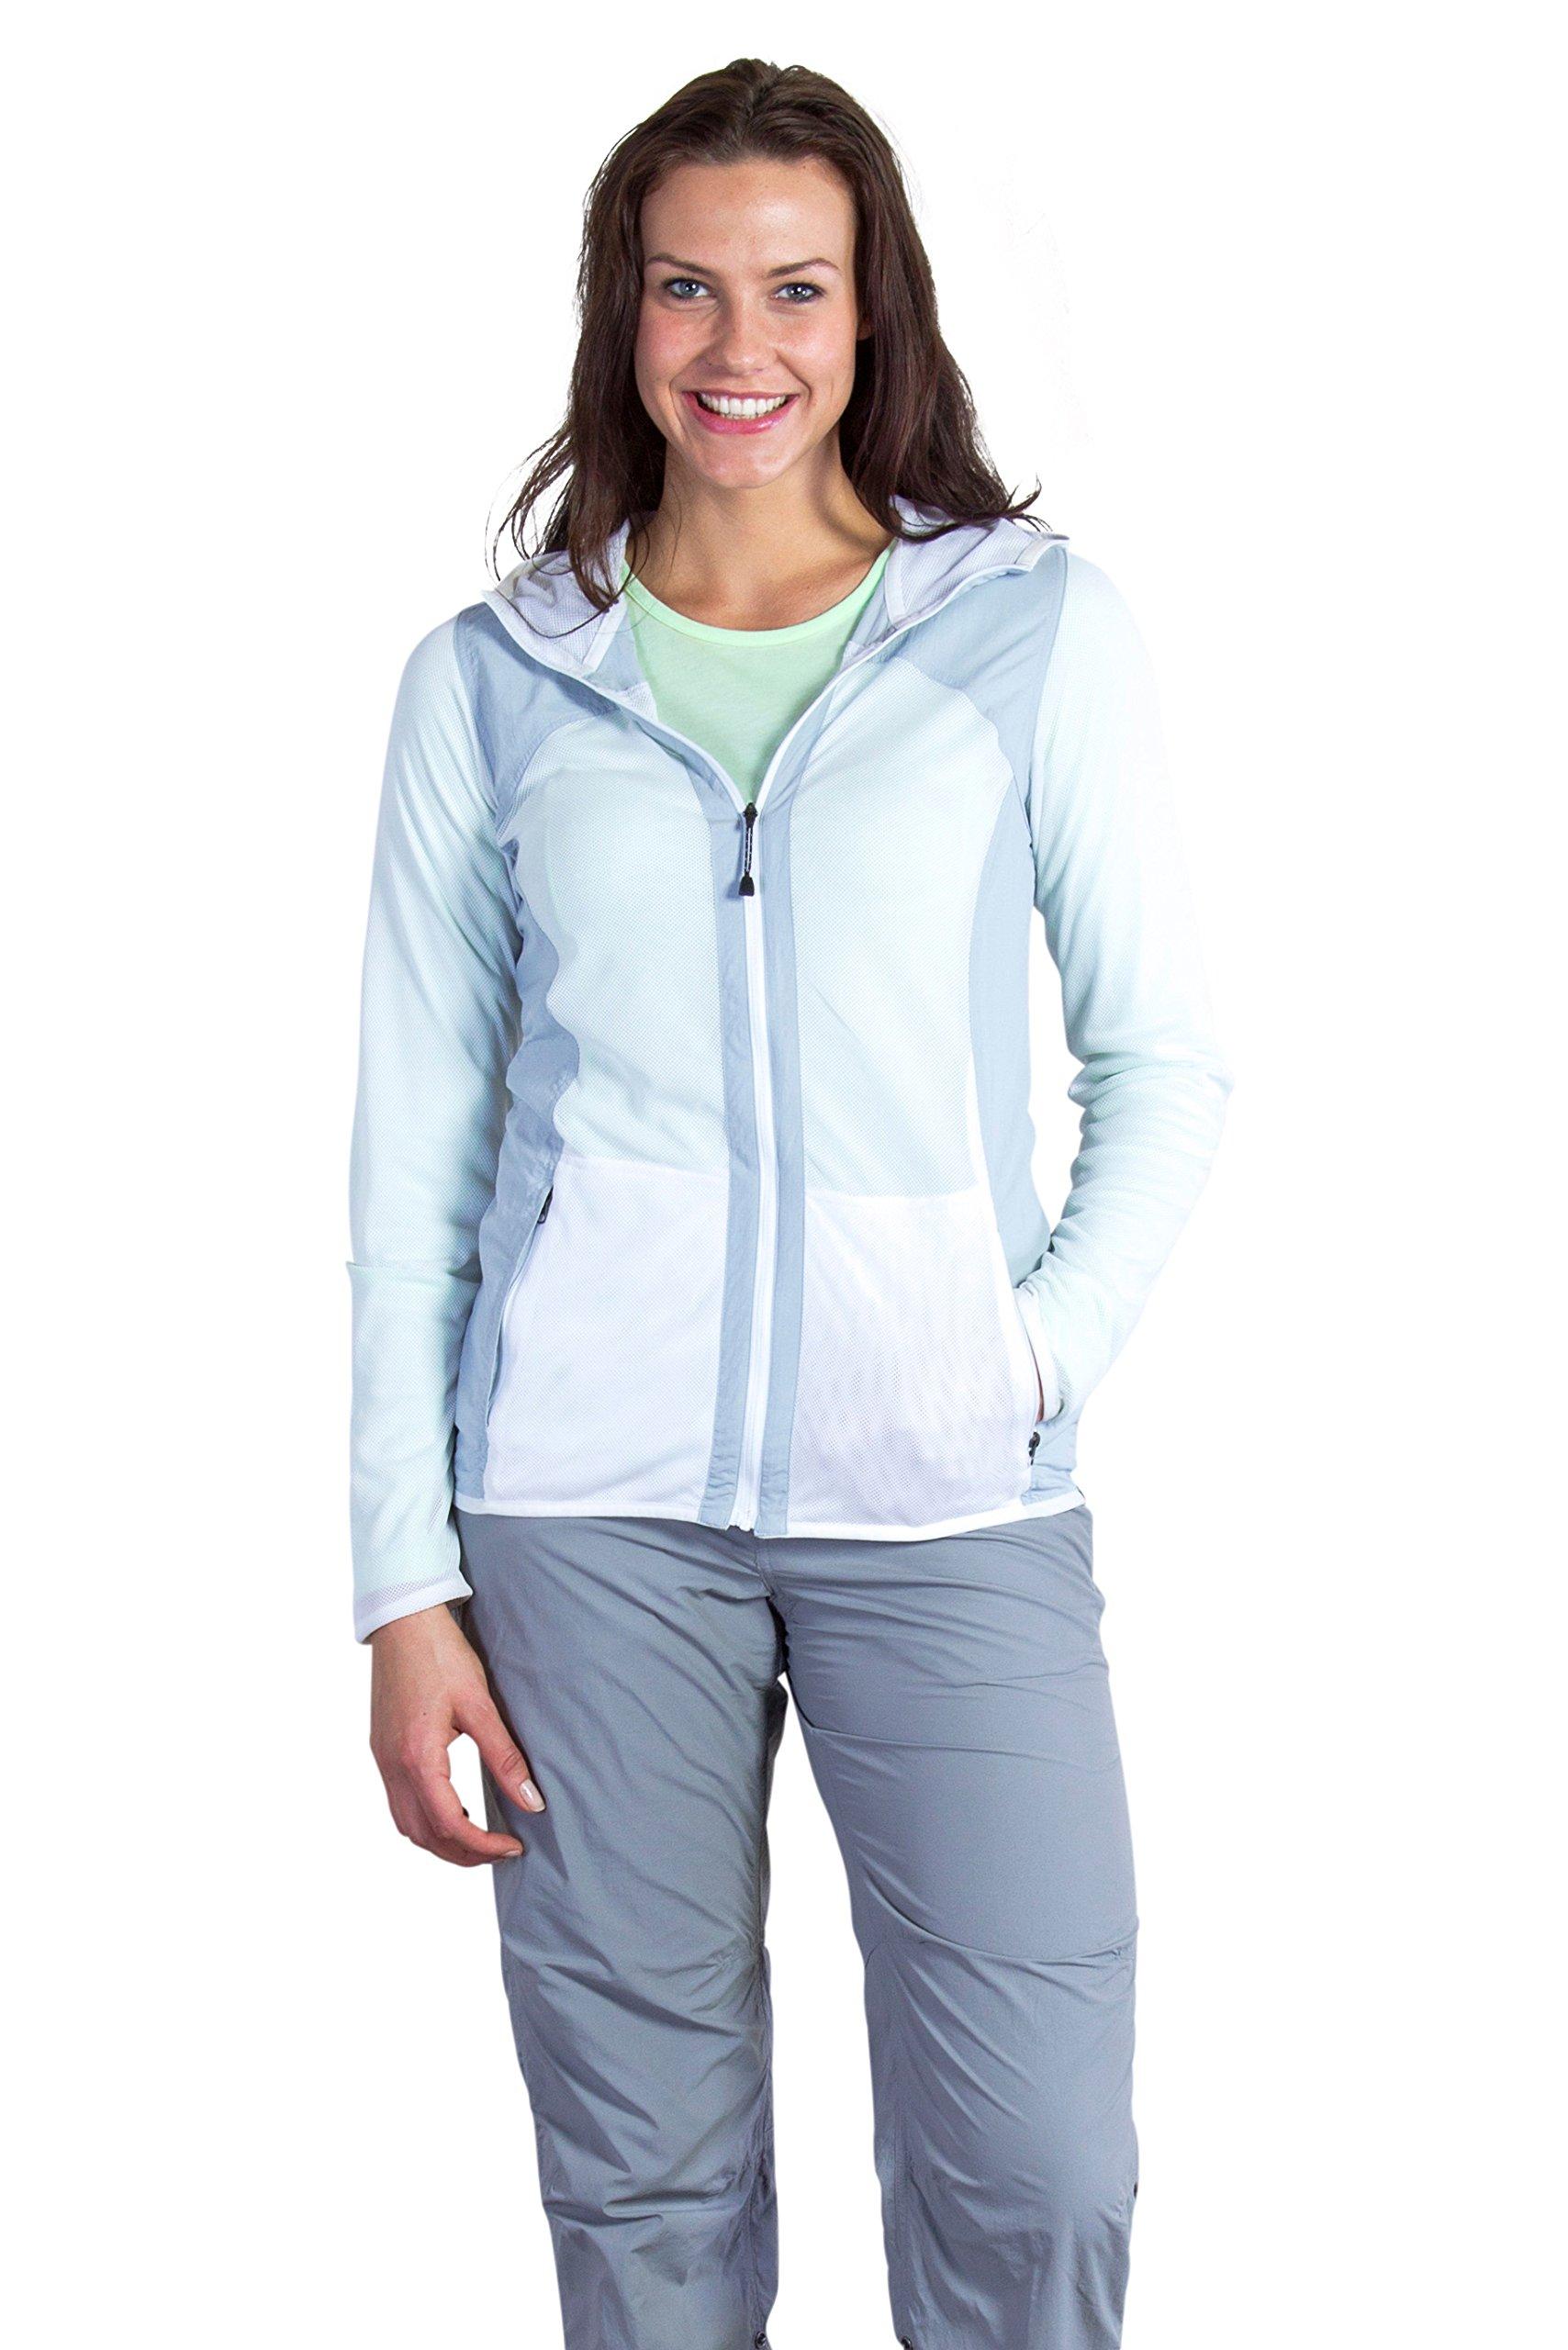 ExOfficio Women's BugsAway Damselfly Jacket, White/Oyster, Small